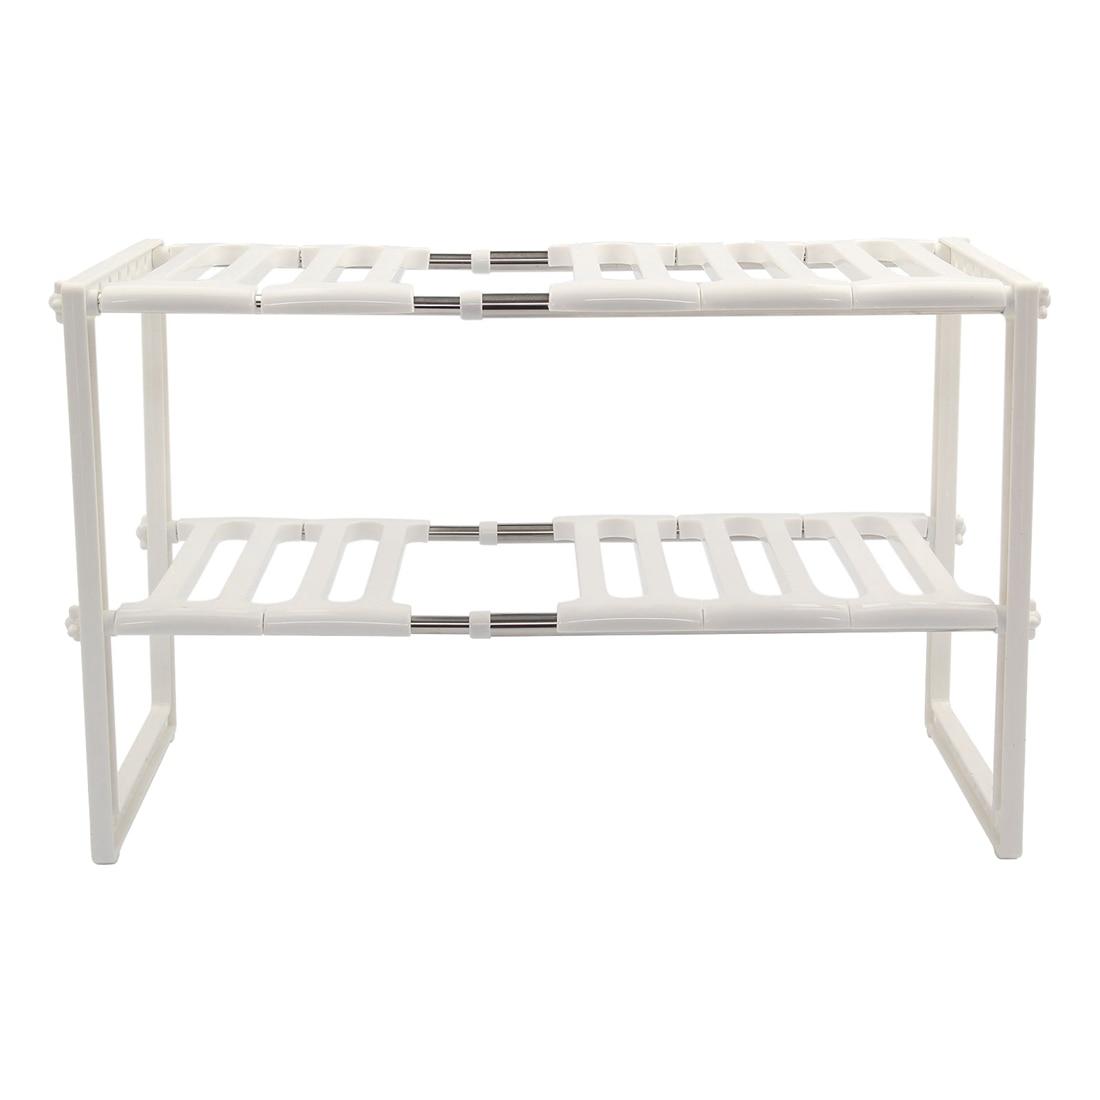 Best Kitchen Rack Organiser Adjustable Removeable Under Sink Storage Tidy Shelf Unit